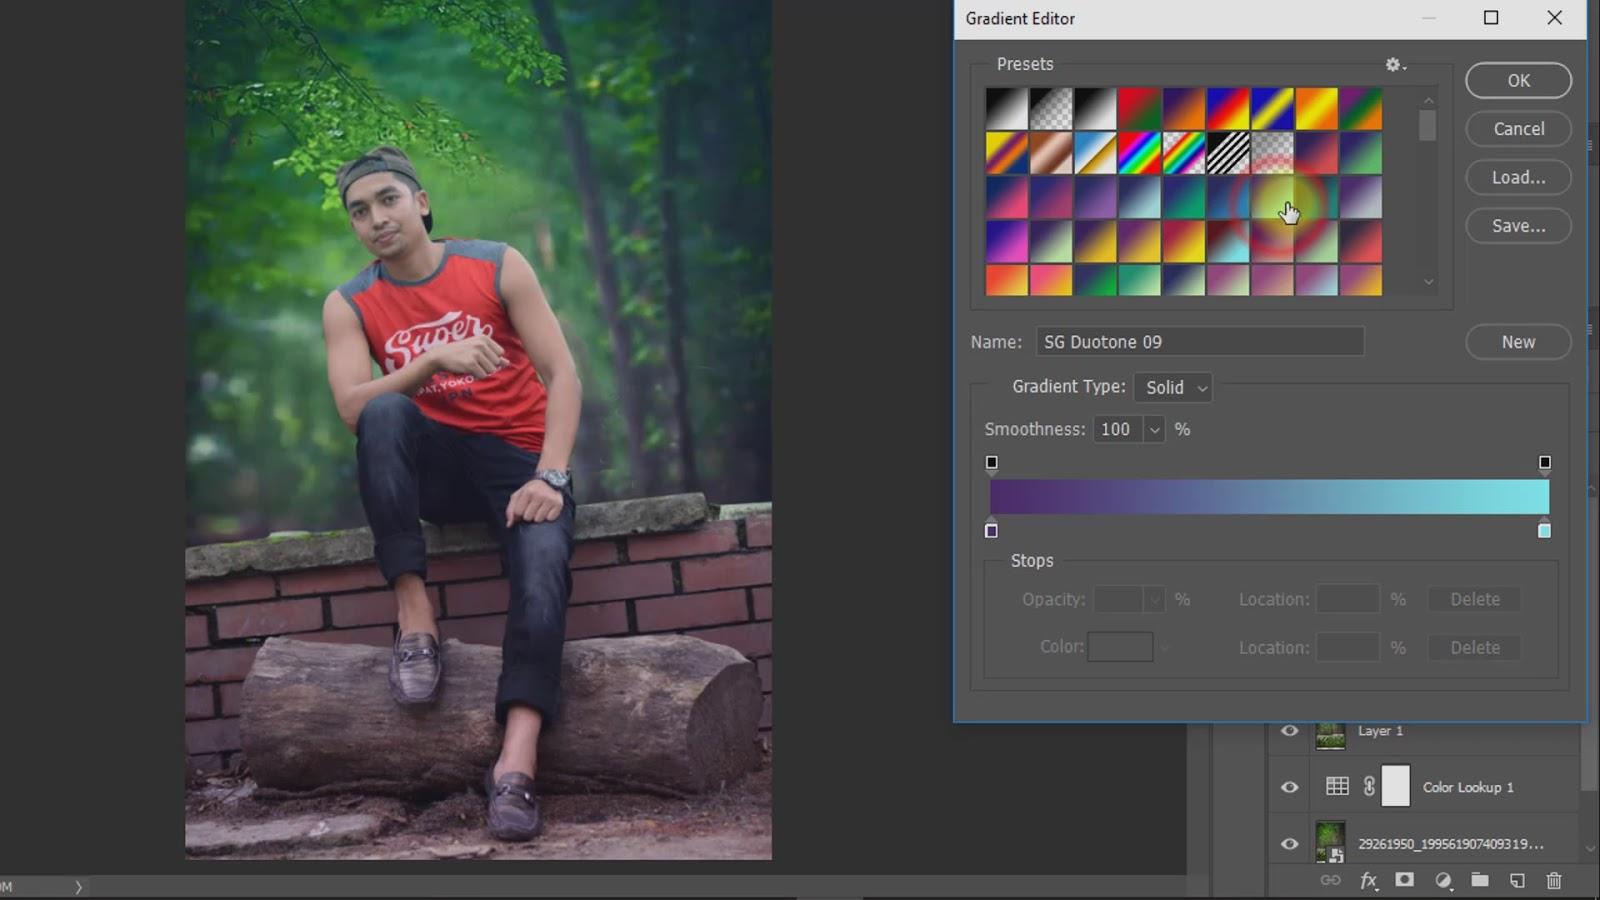 outdoor portrait photo manipulations working screenshot 4